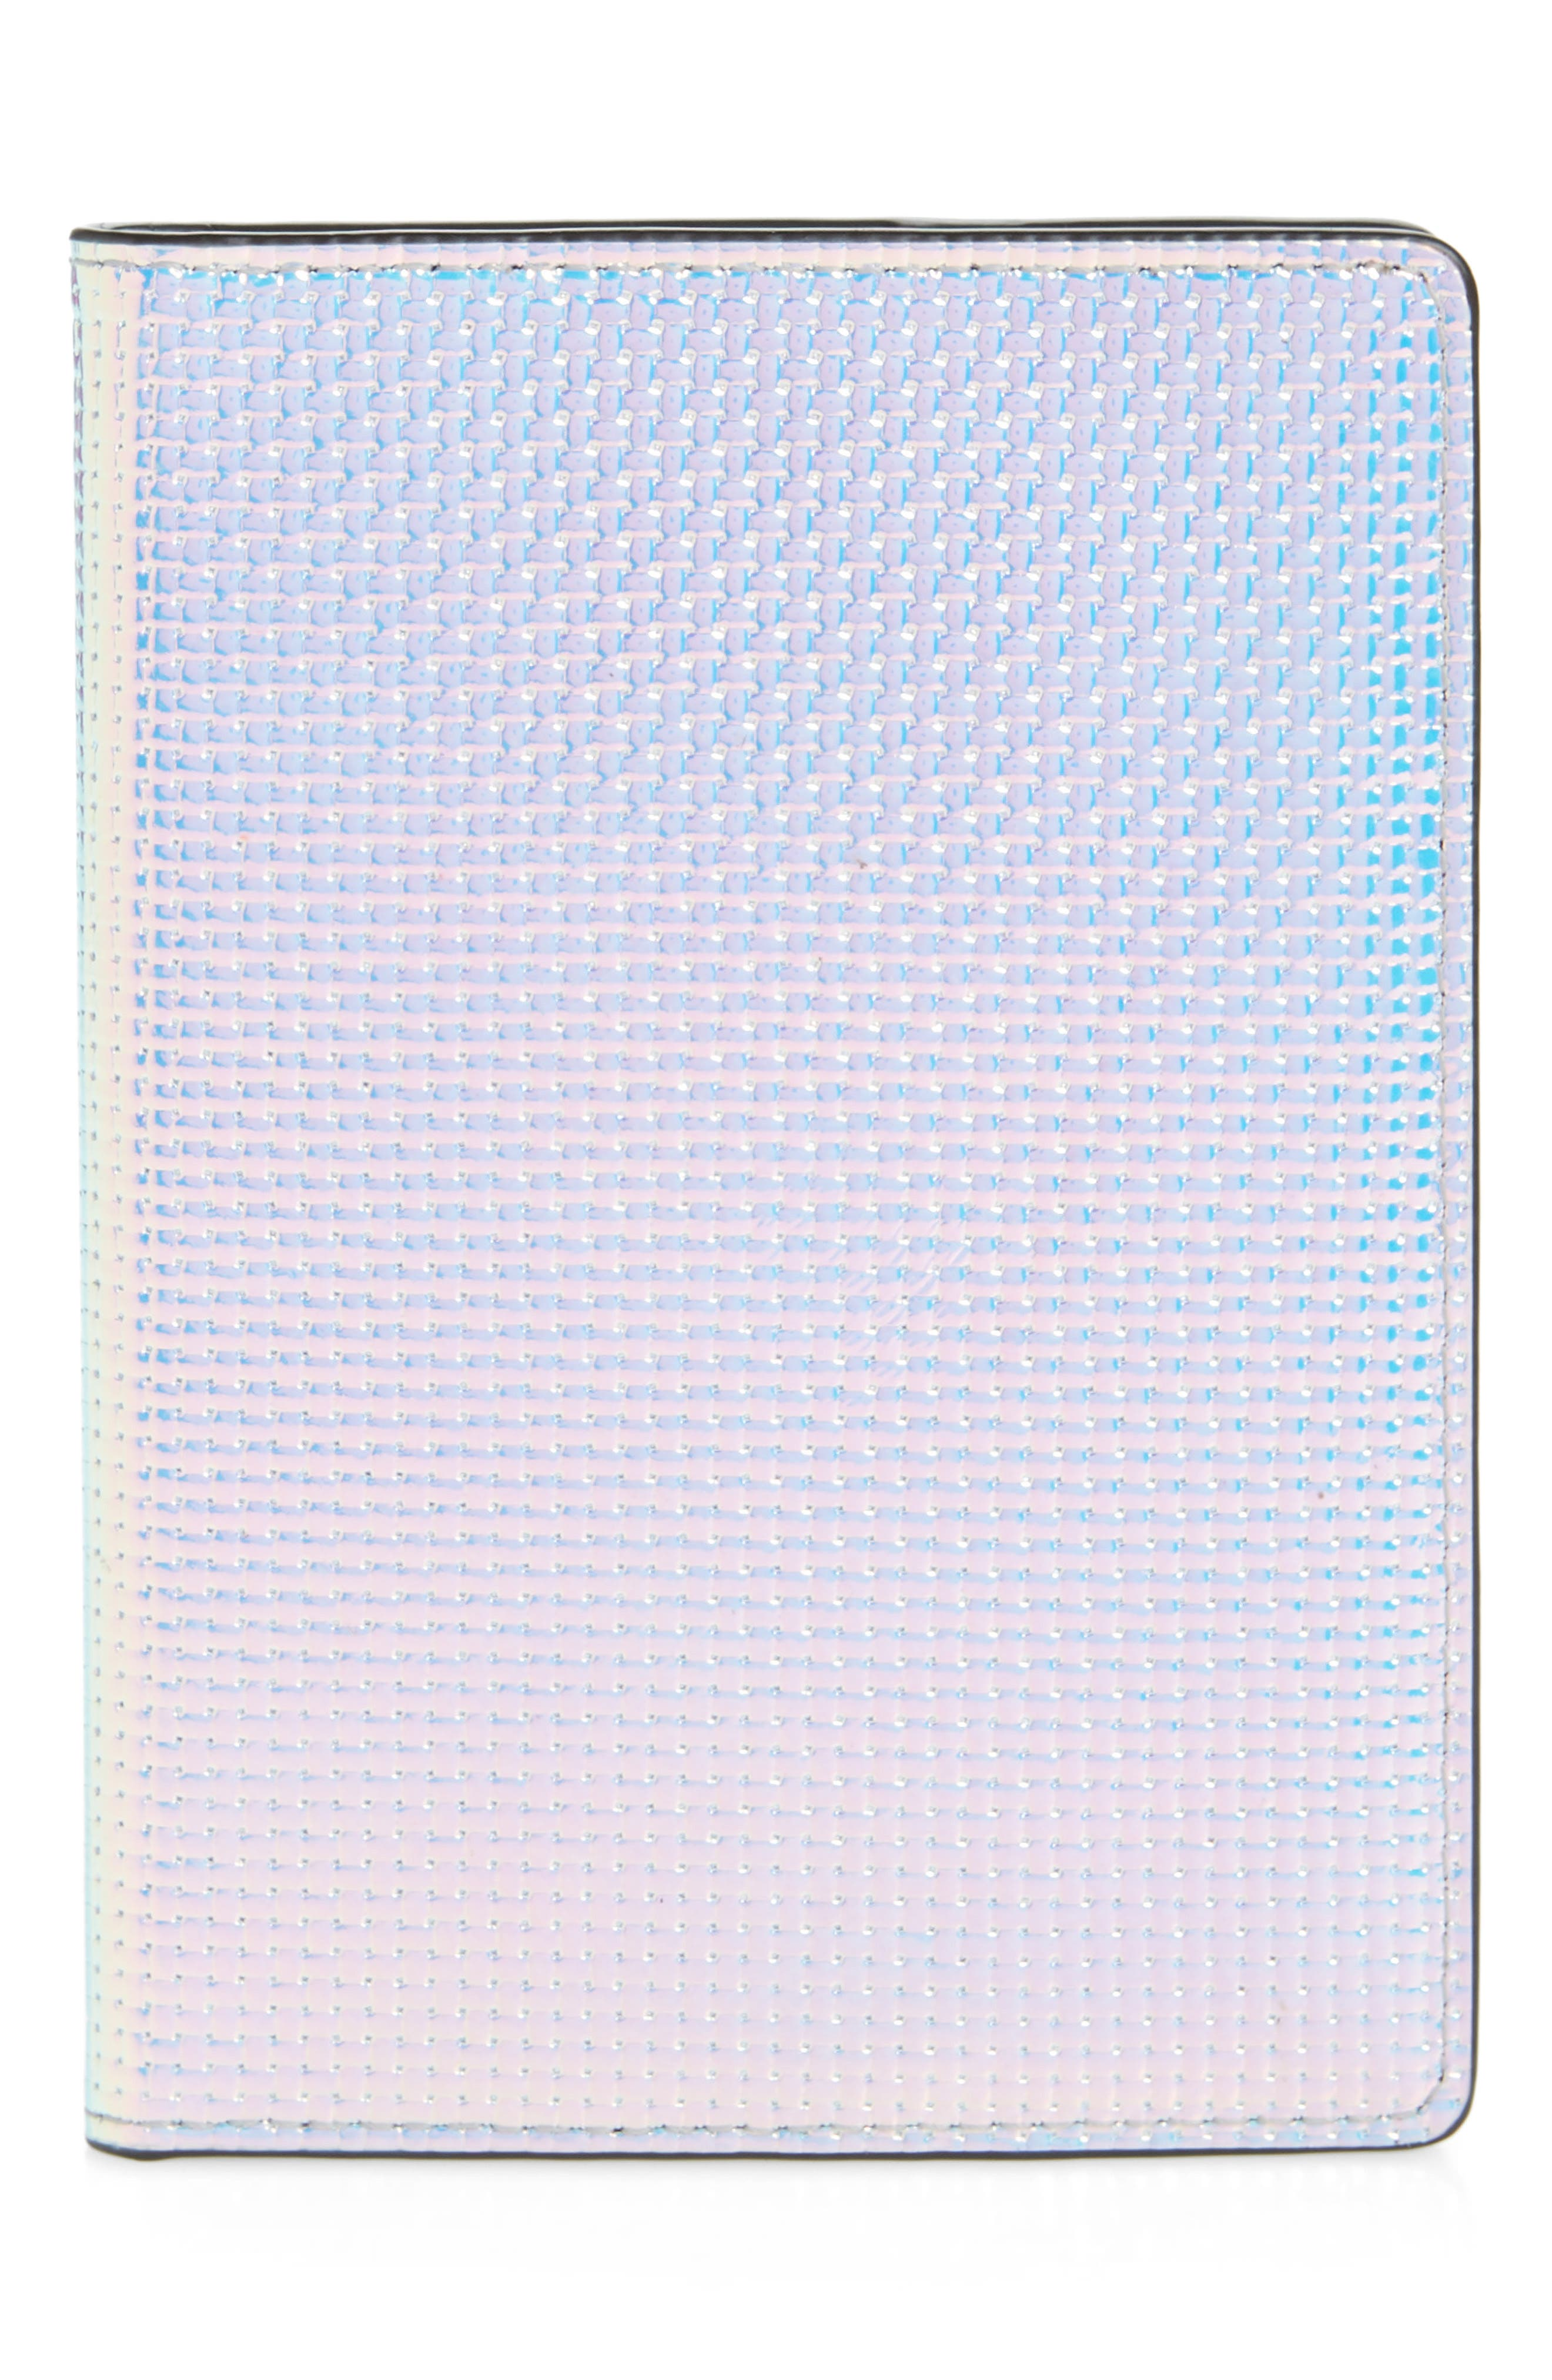 REBECCA MINKOFF, Iridescent Passport Case, Main thumbnail 1, color, OPAL IRIDESCENT